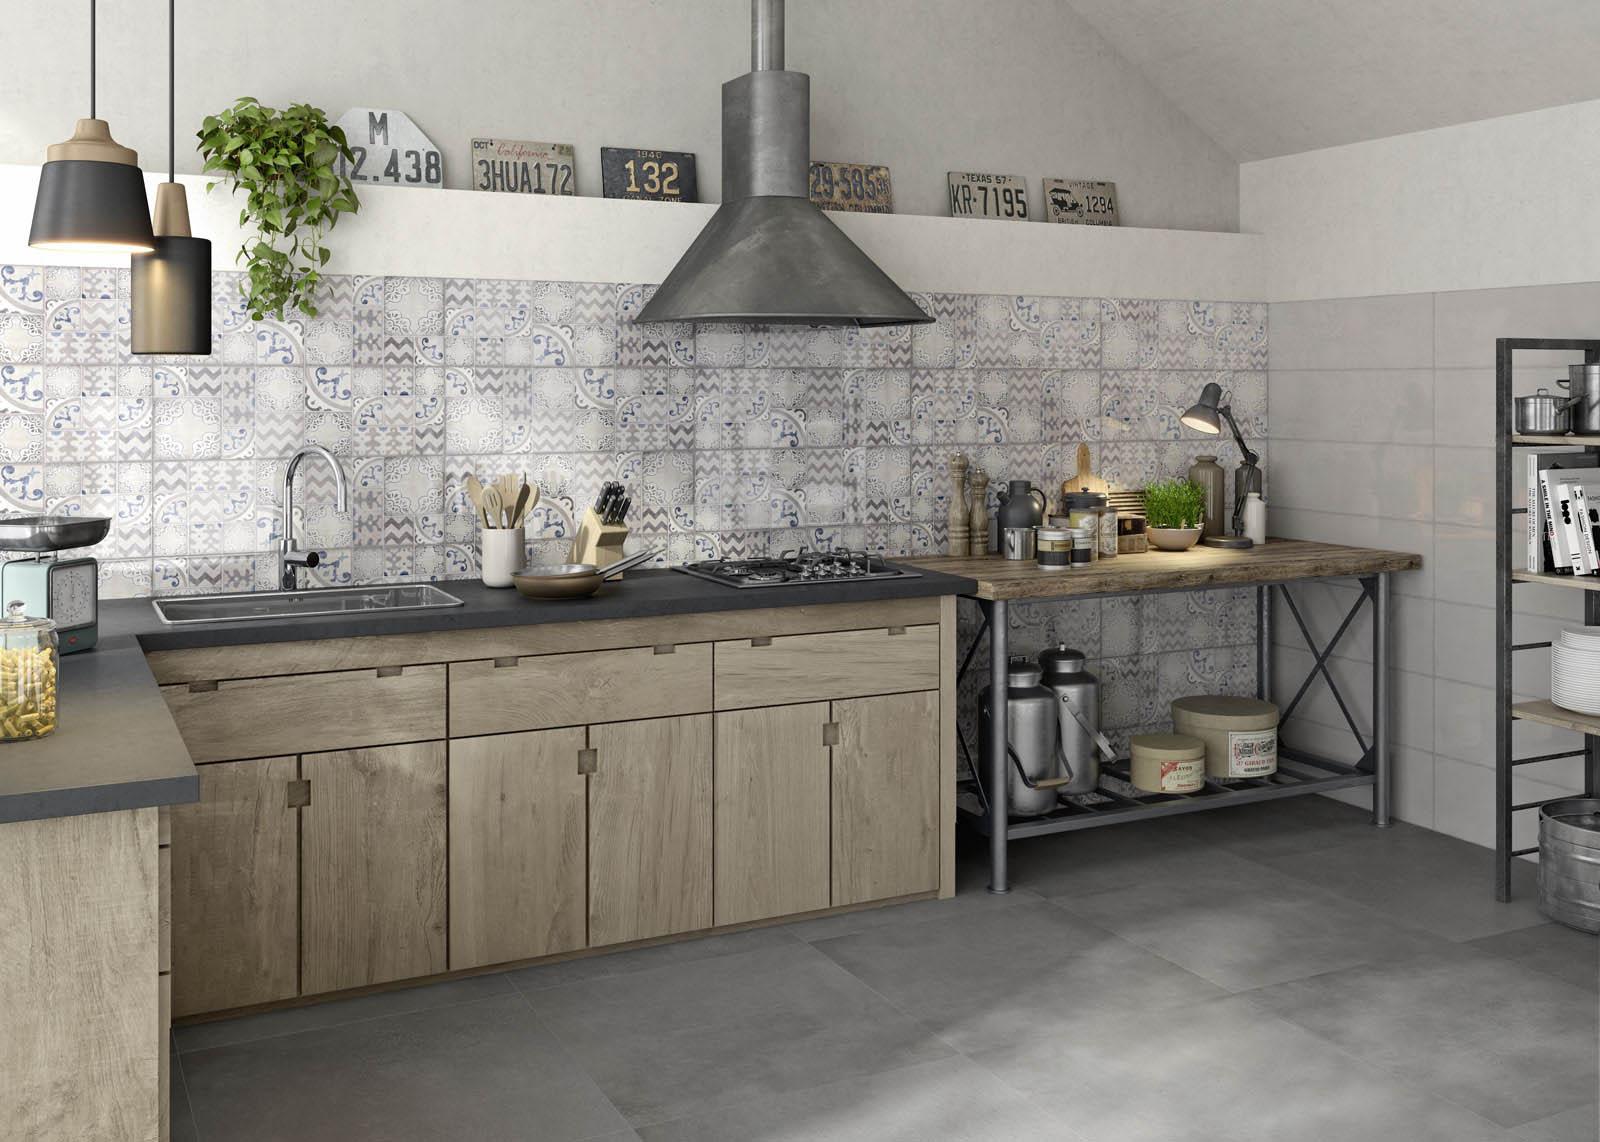 Piastrelle cucina idee in ceramica e gres marazzi - Piastrelle a mosaico per cucina ...